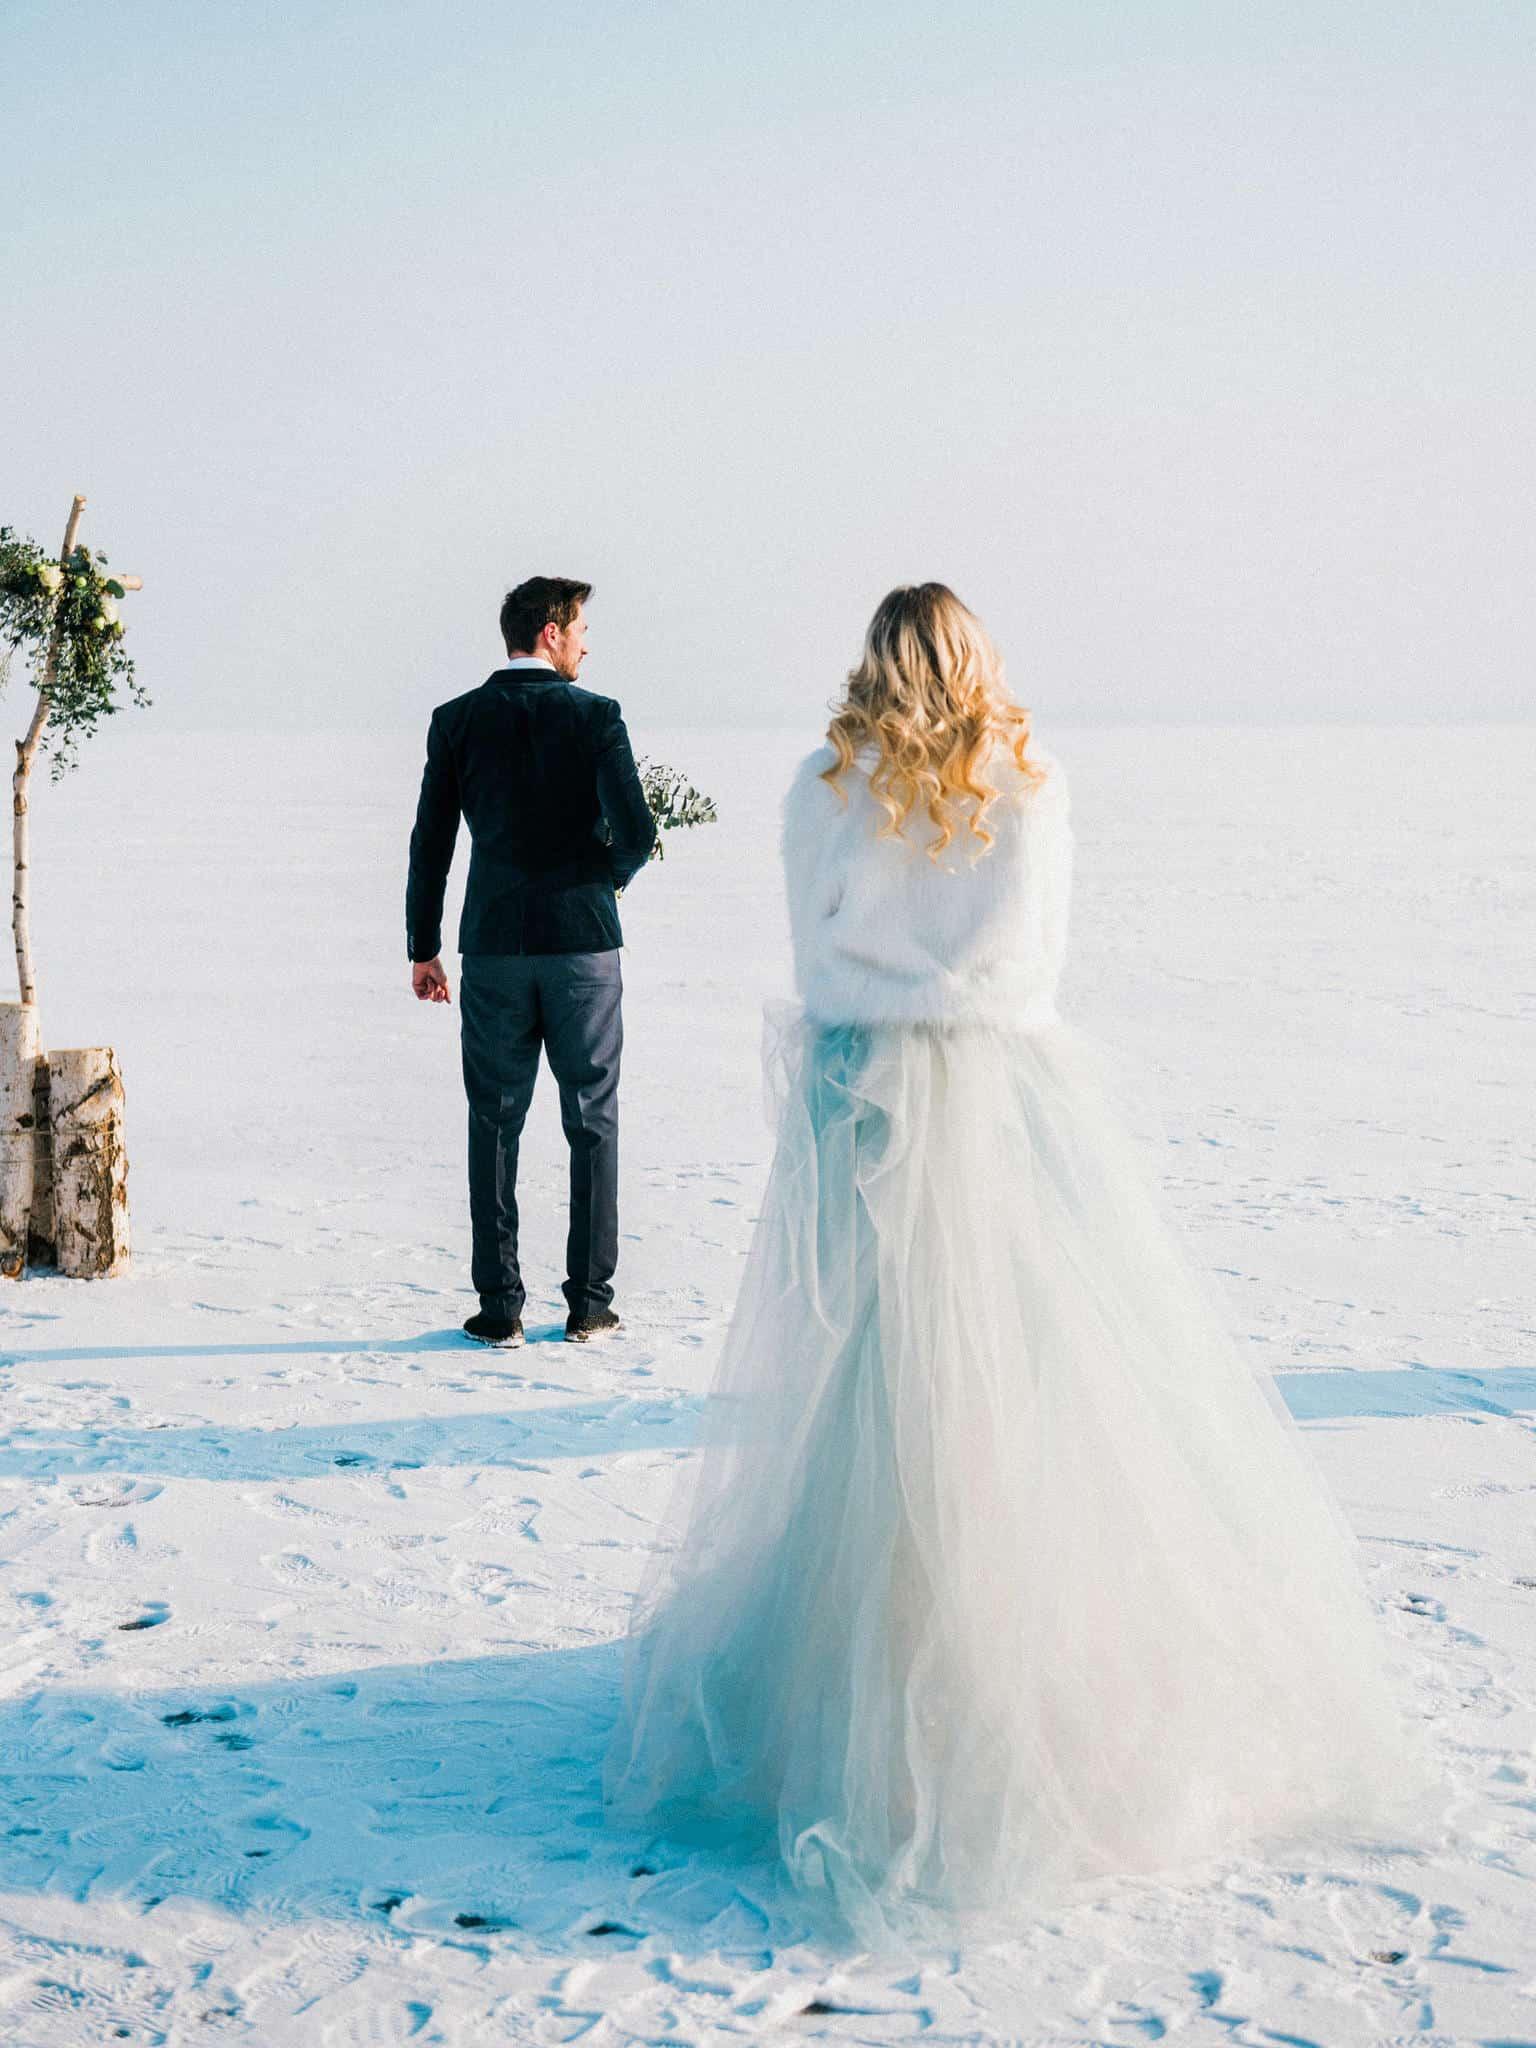 12_wedoverhills_elopement_inspiration_first_look